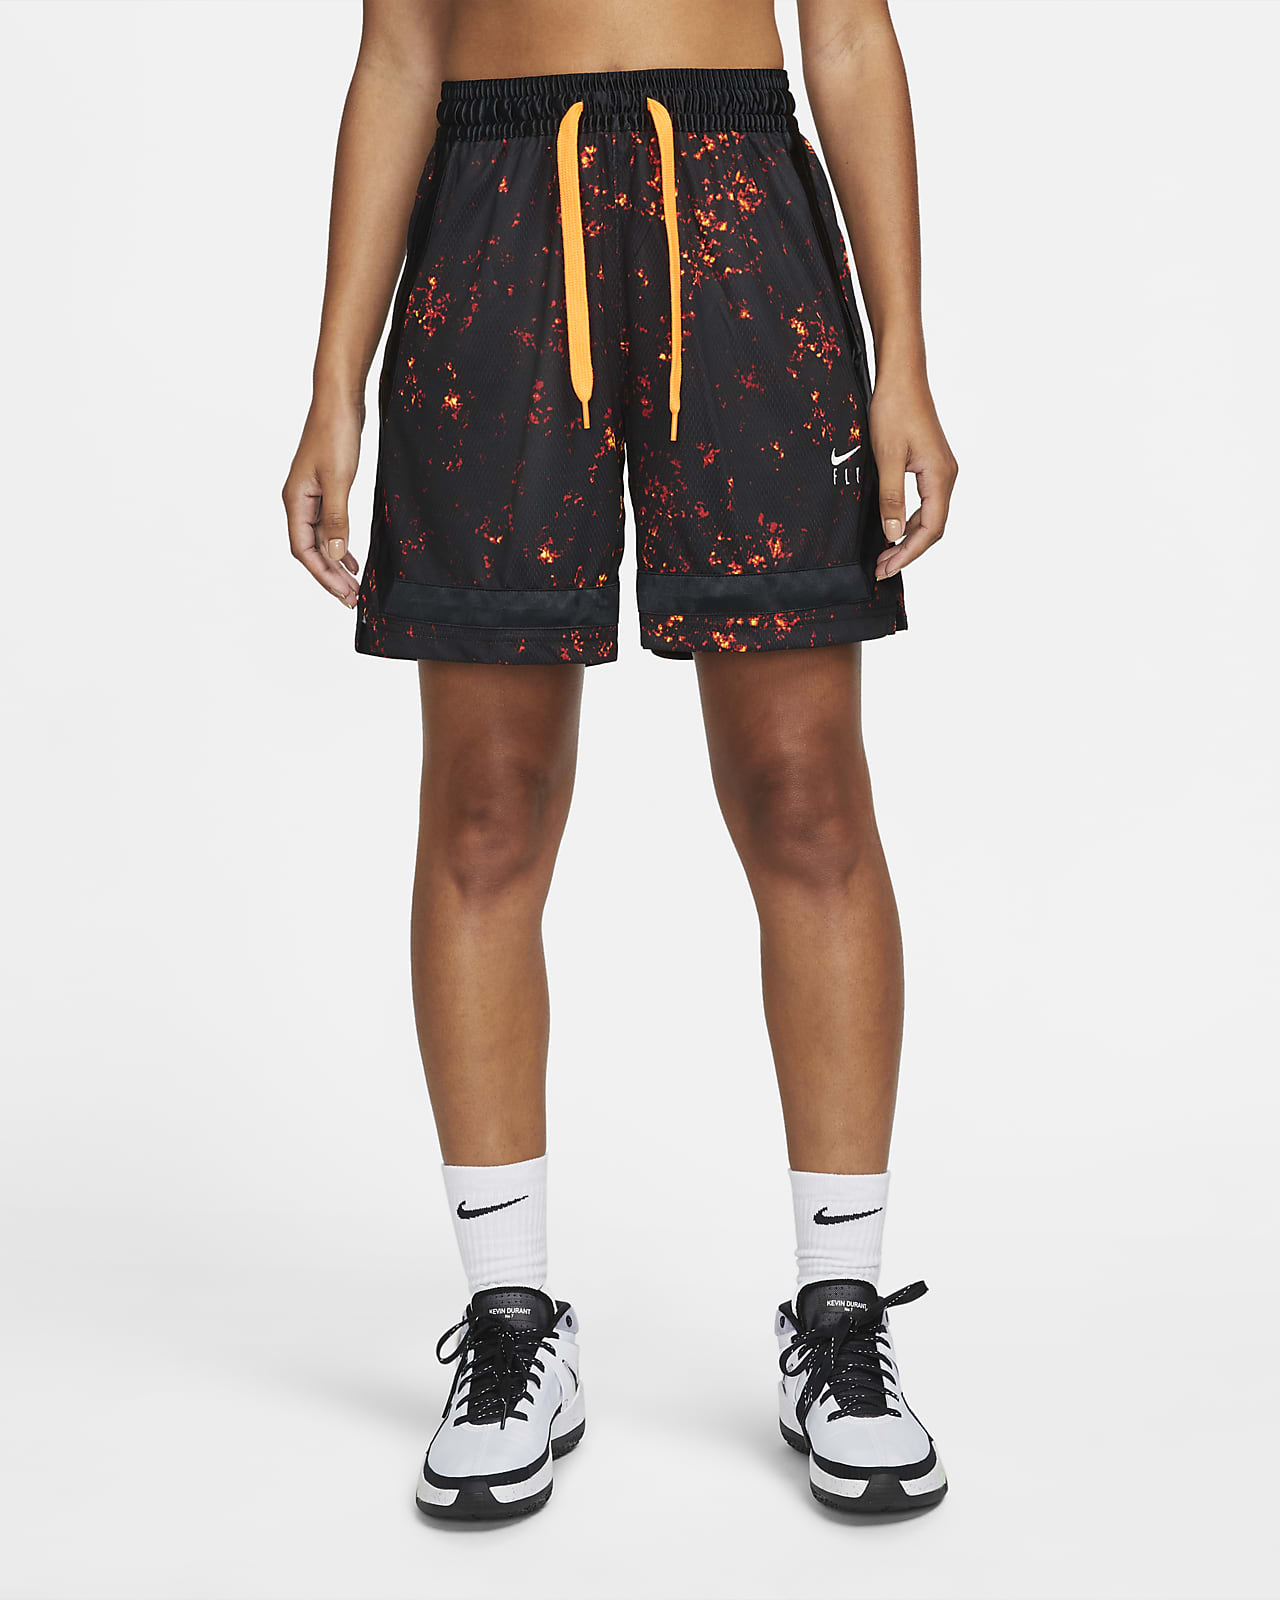 Nike Fly Crossover basketbalshorts voor dames